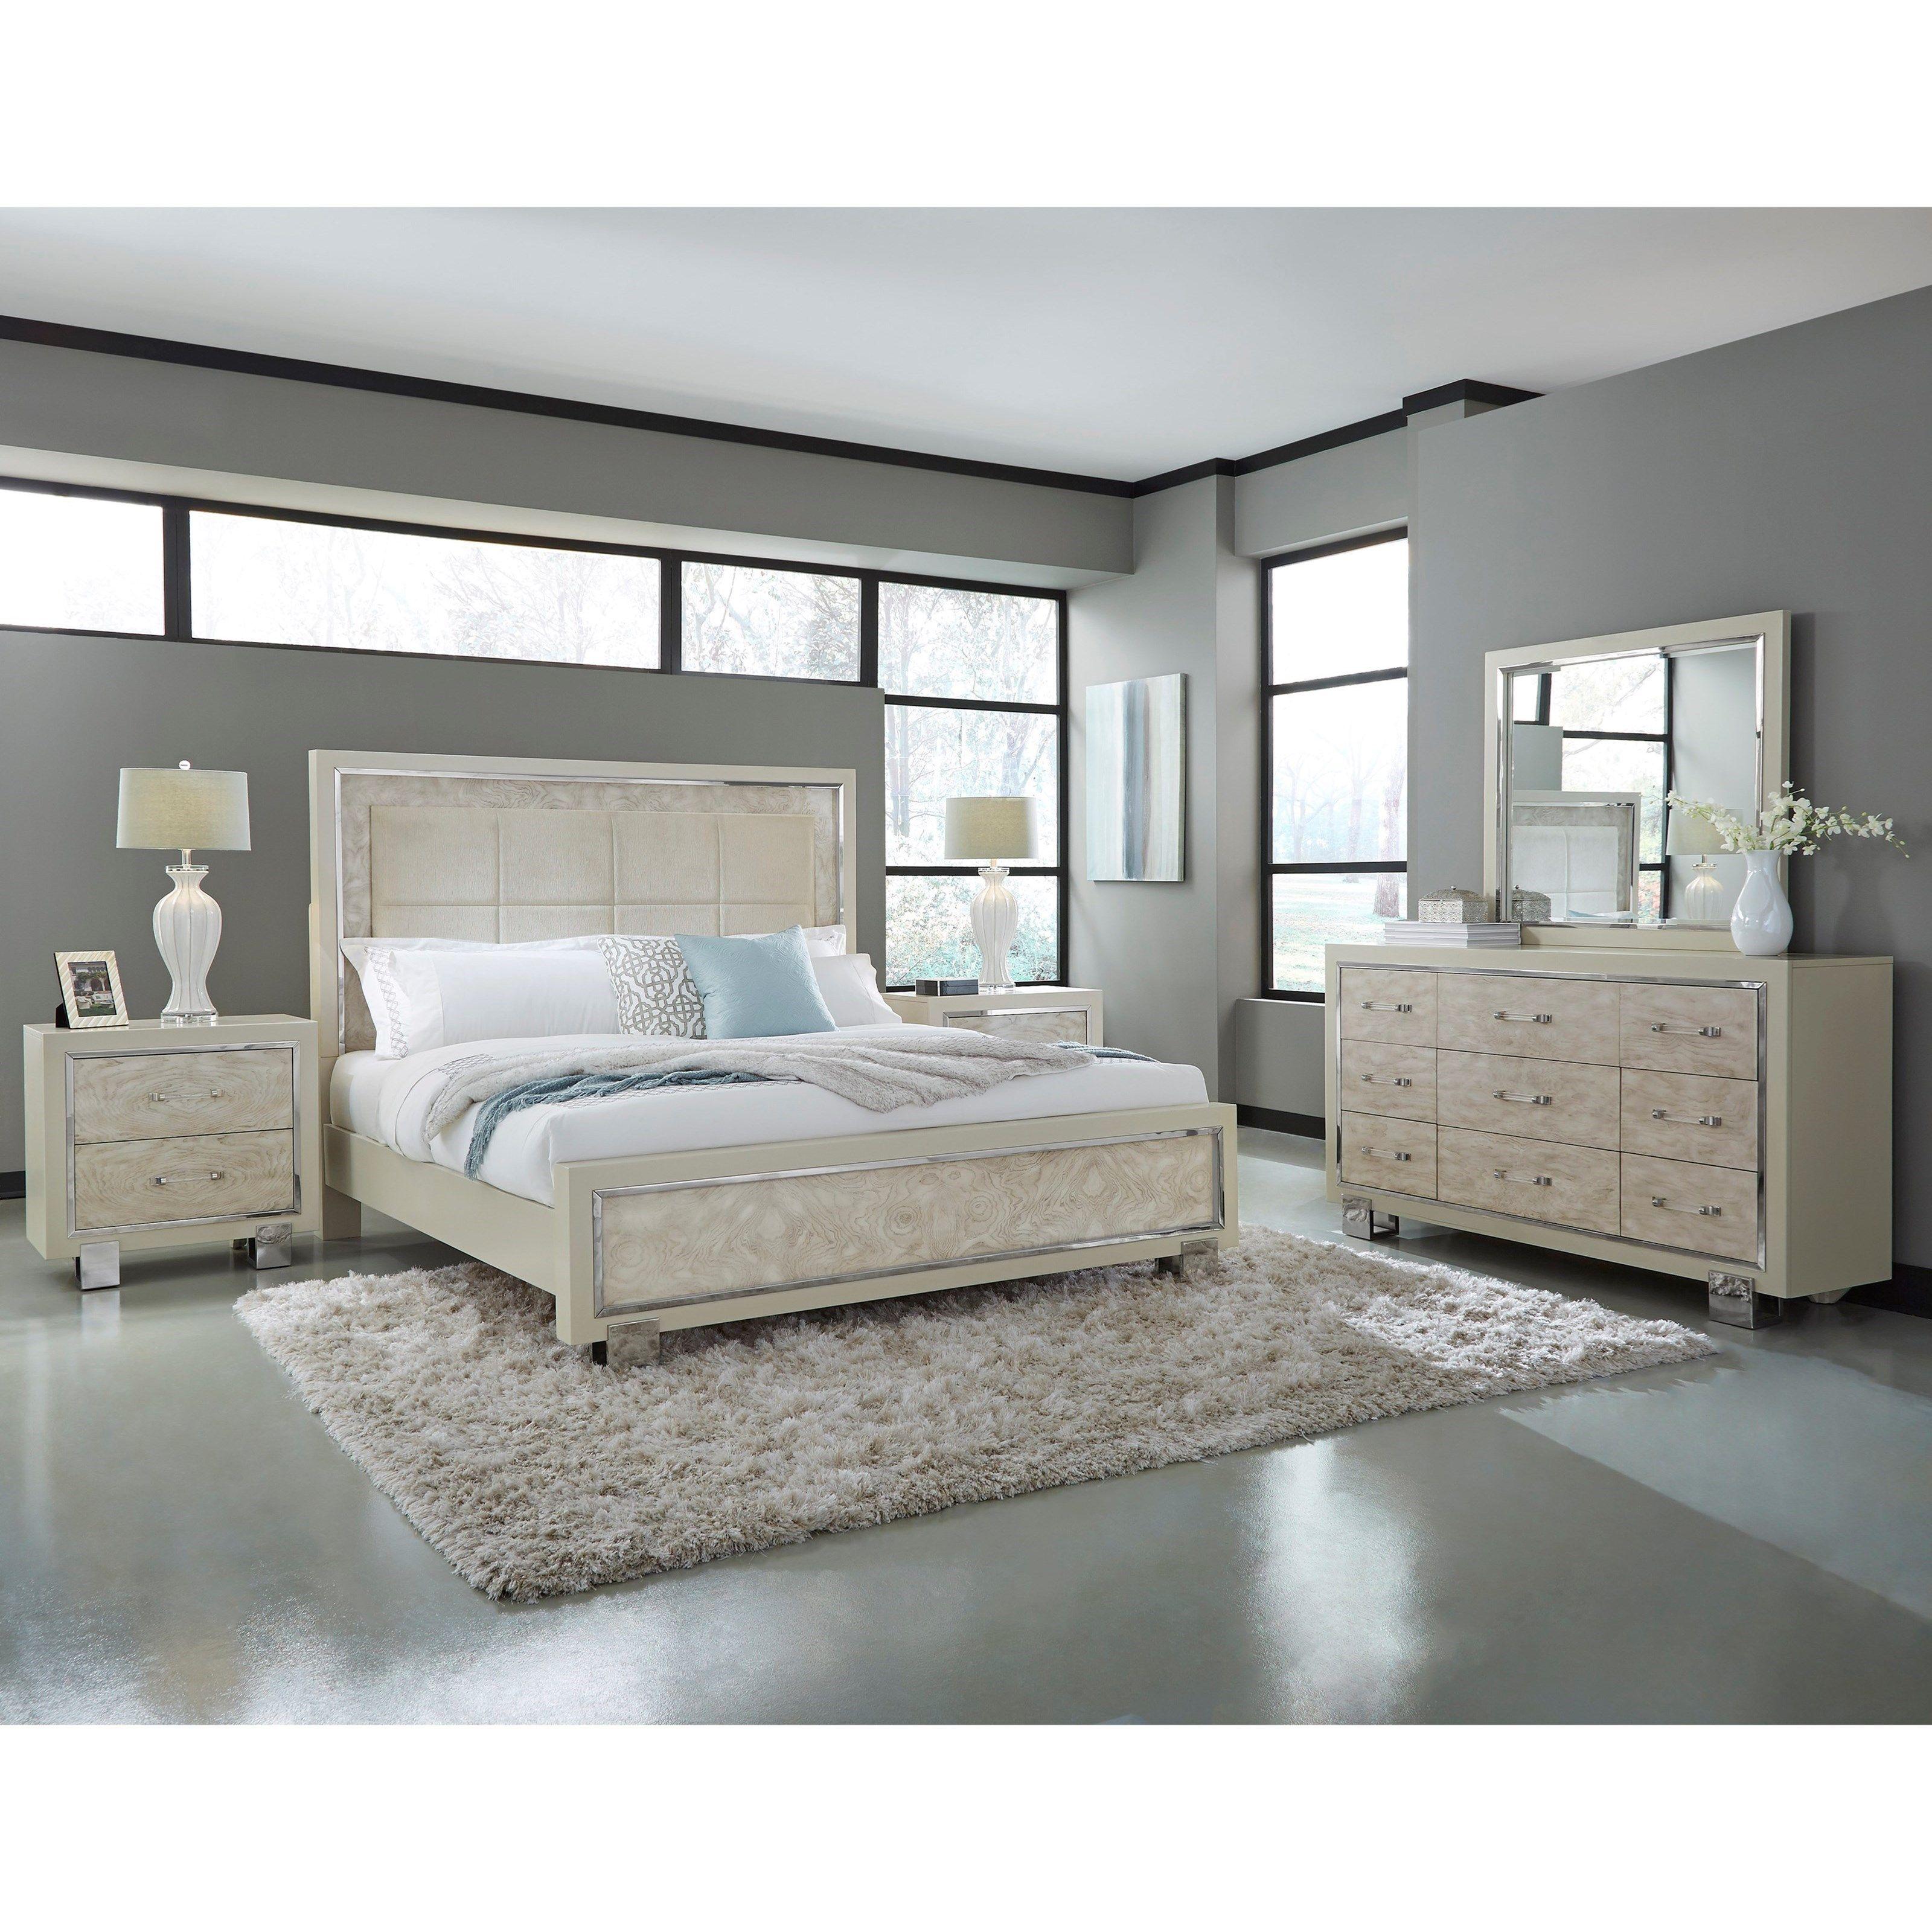 Cydney Queen Bedroom Group by Pulaski Furniture Bedroom